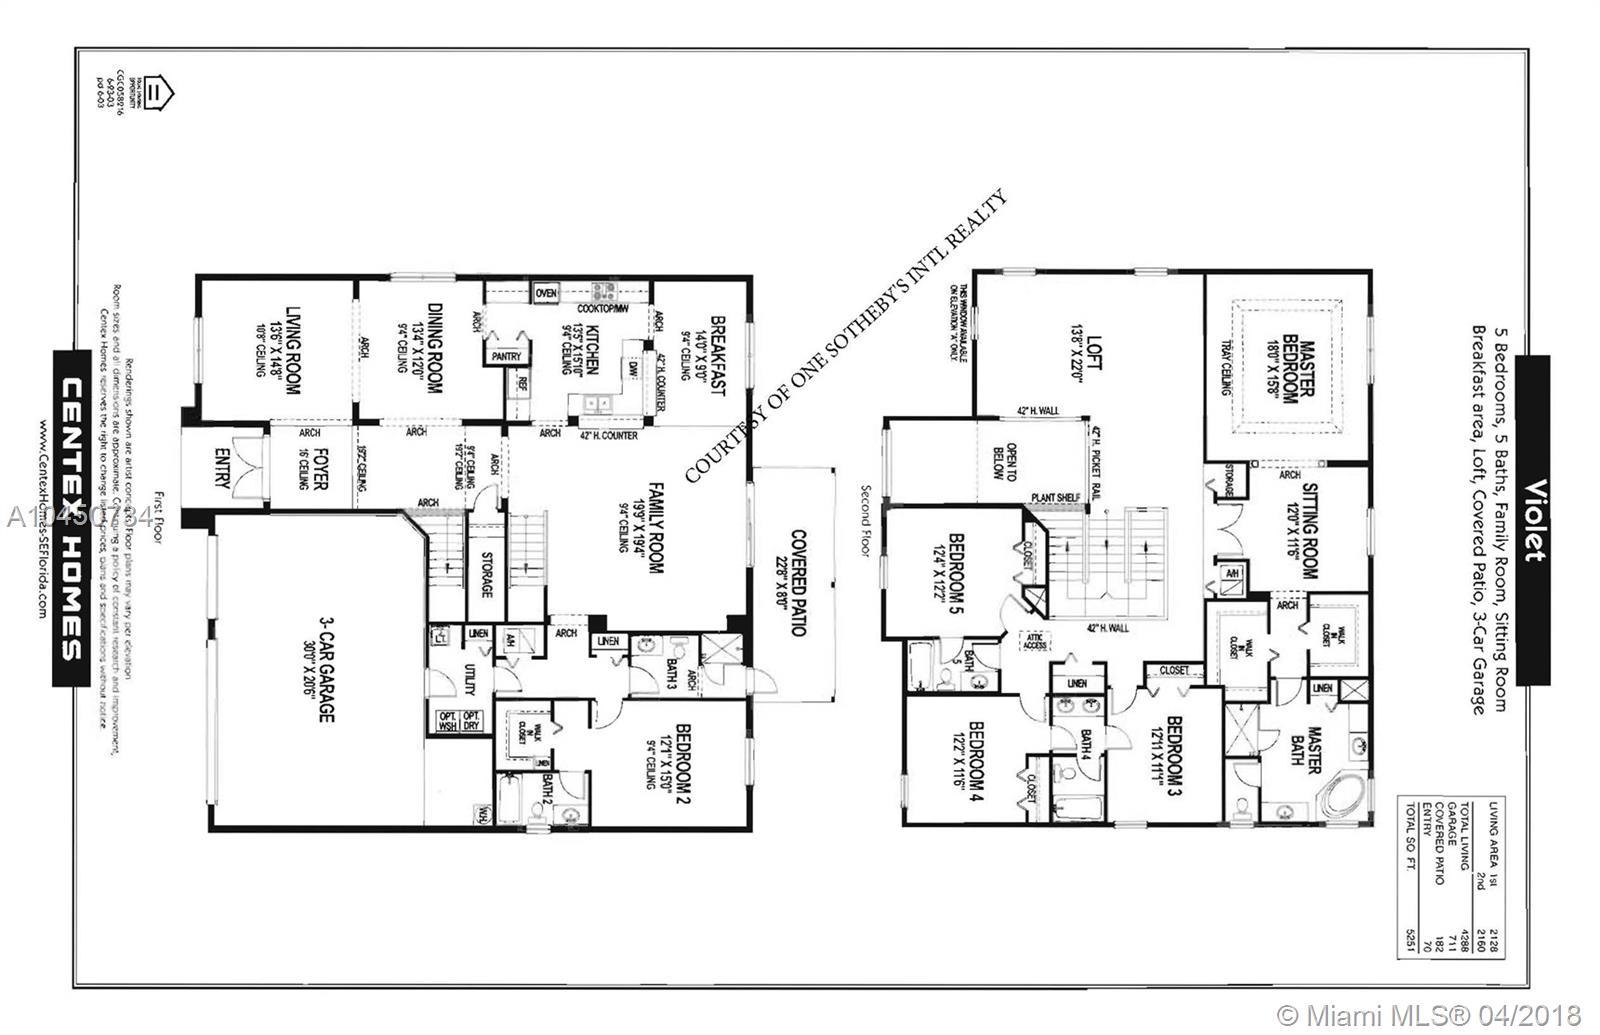 3884 E Hibiscus St, Weston FL, 33332